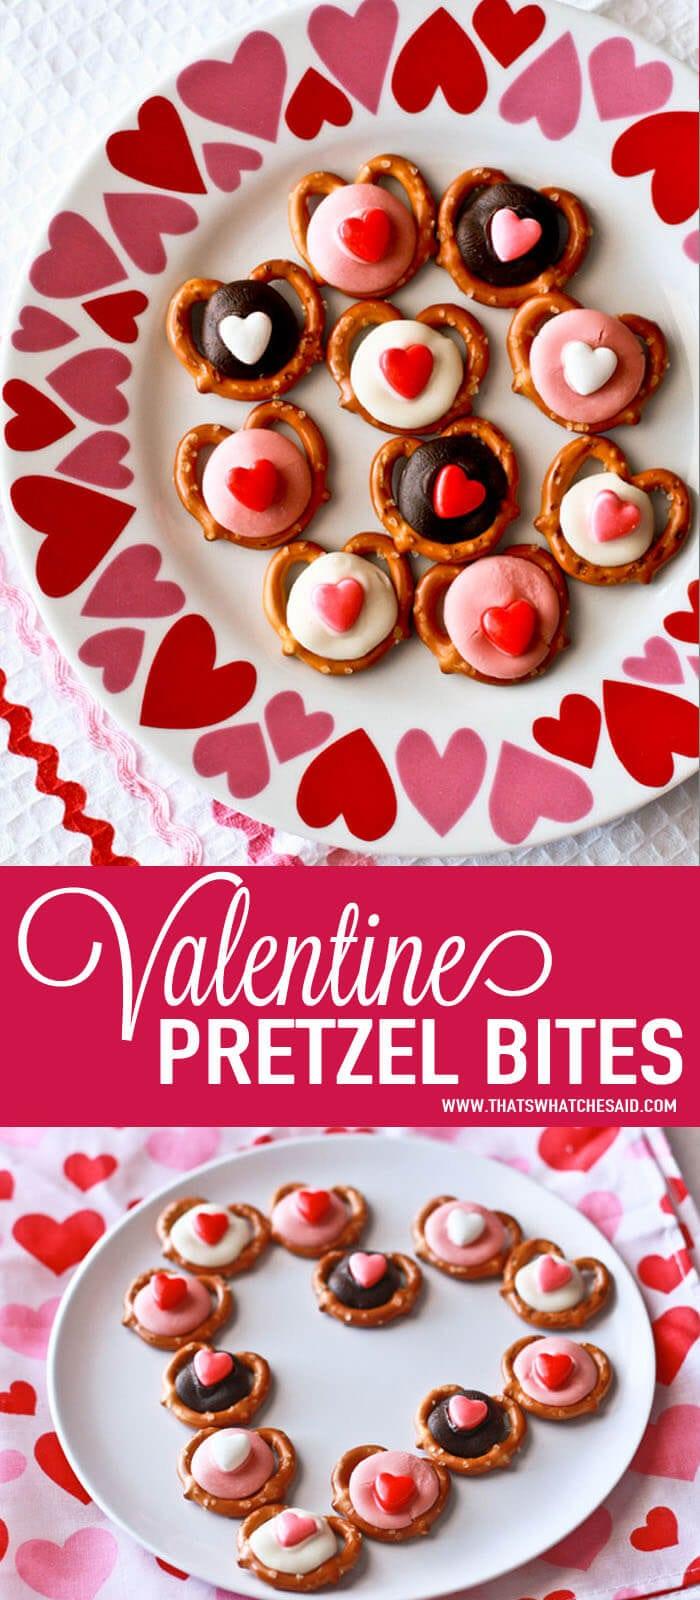 Easy Valentine Pretzel Bites at www.thatswhatchesaid.com